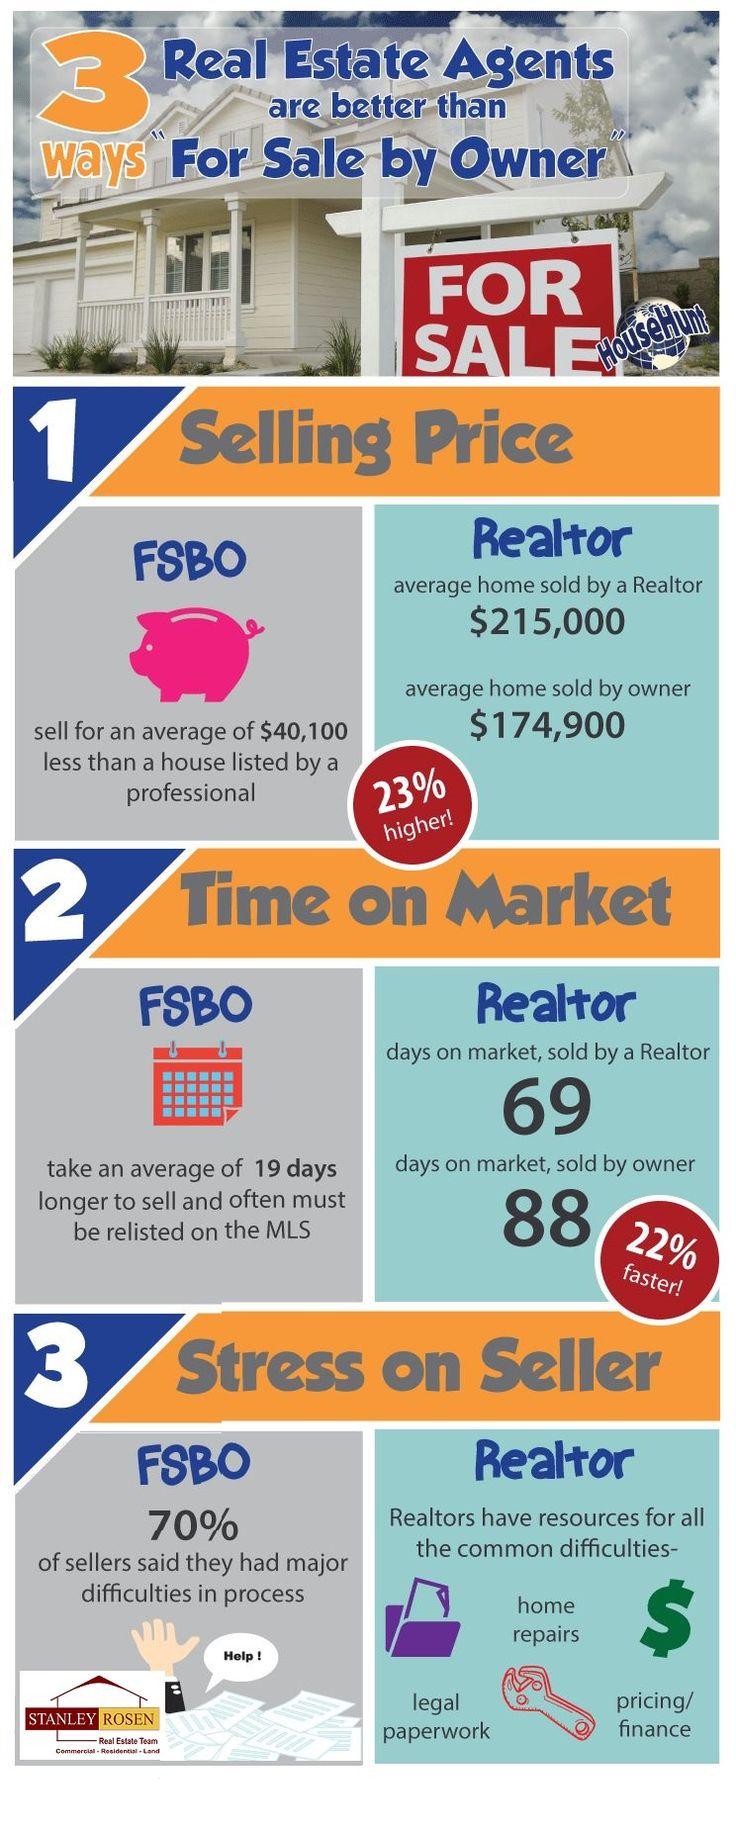 For Sale By Owner(FSBO) VS. Realtor www.MyFSBOCoach.com #FSBOTips #FSBO